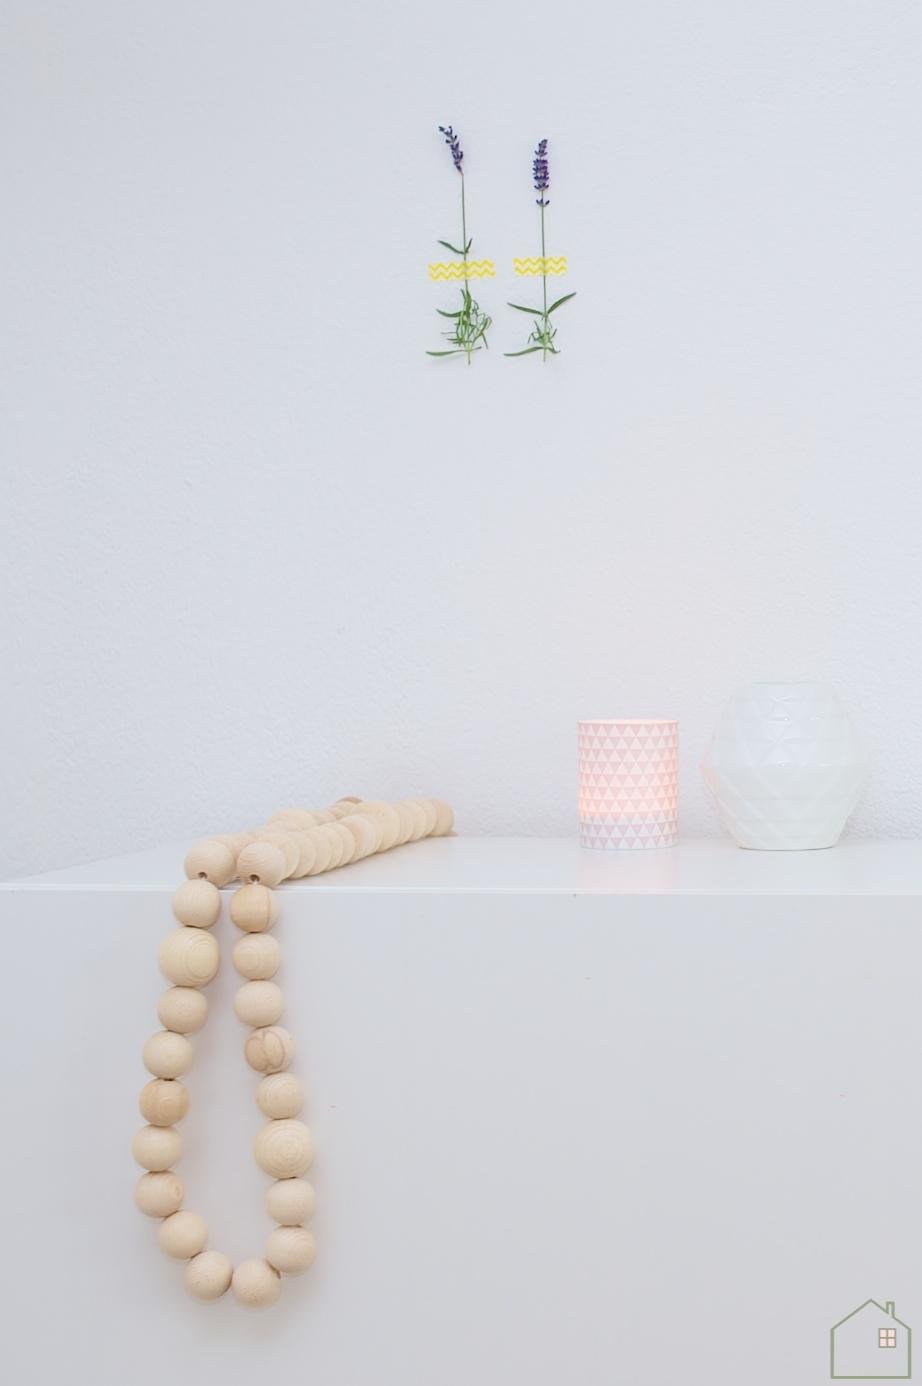 diy slinger houten kralen zoutepopcorn 1 (1)